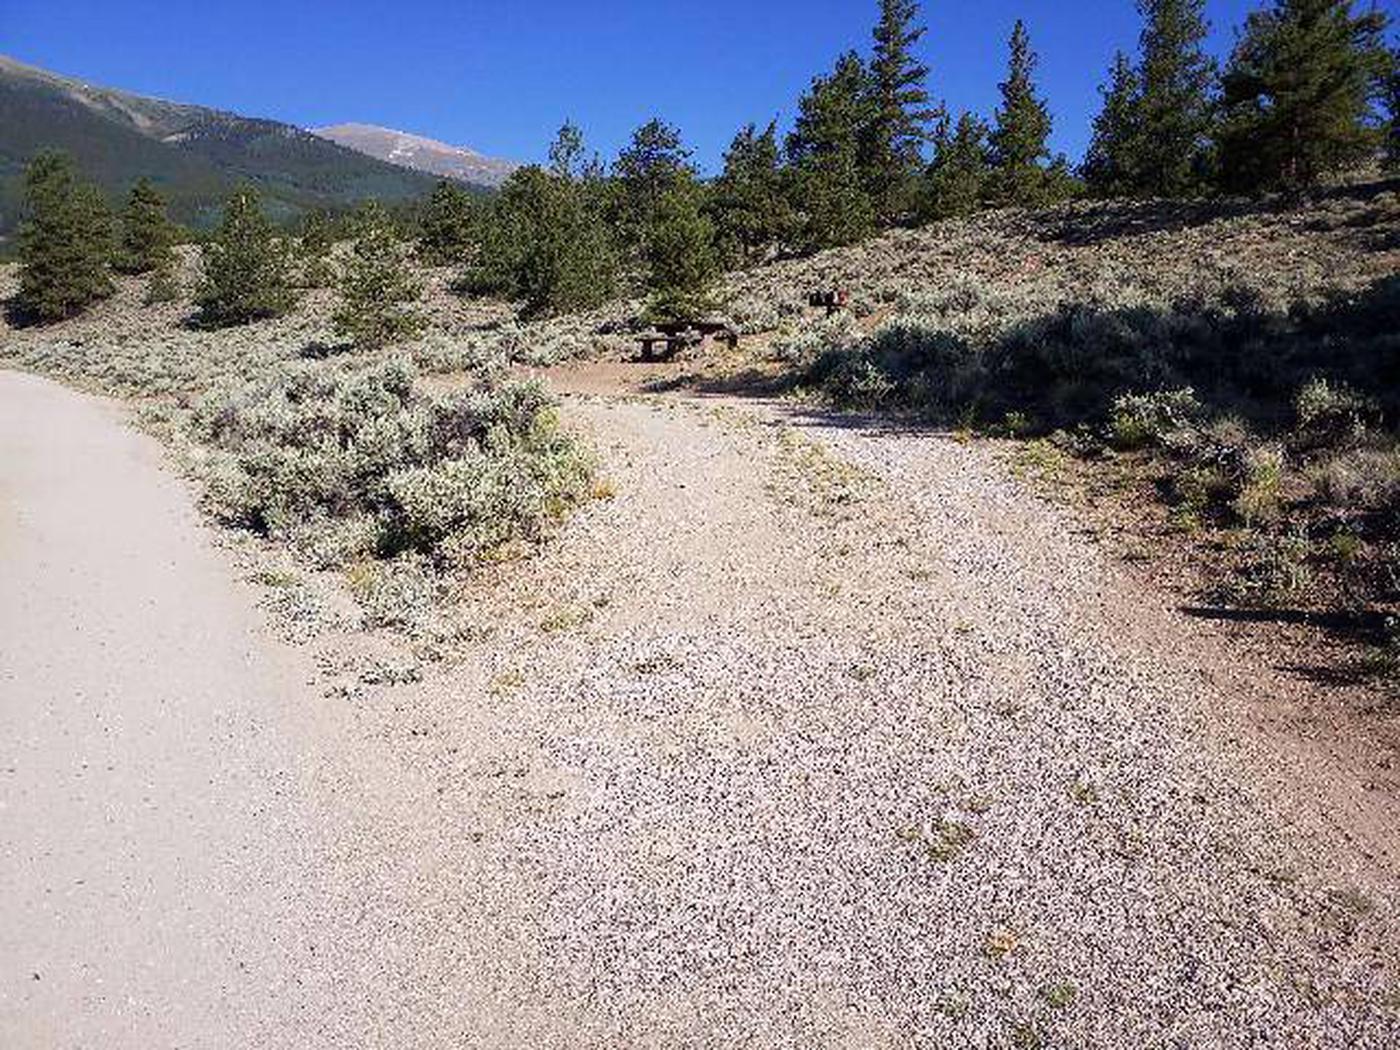 White Star Campground, site 56 pull-through parking